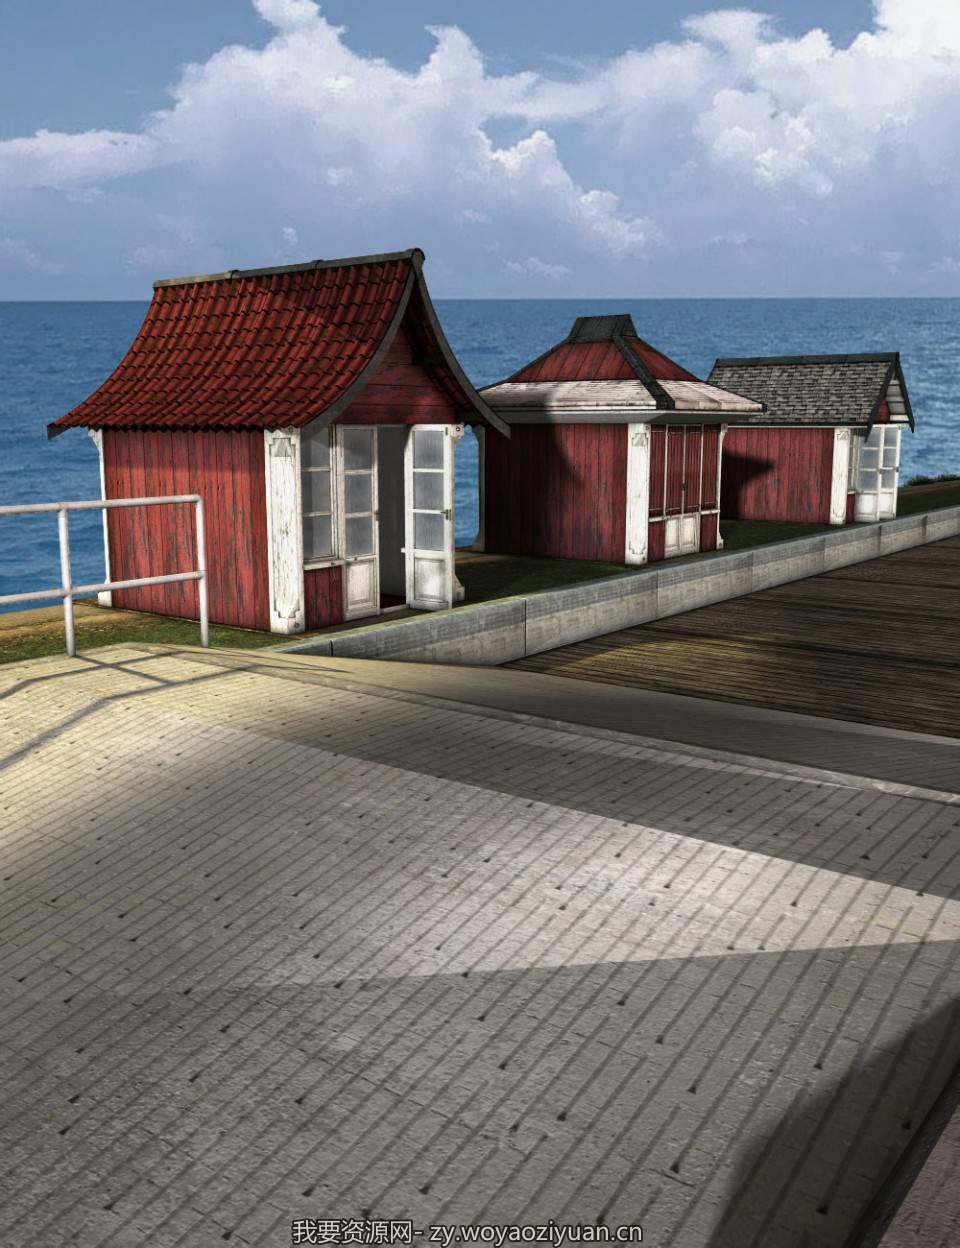 The Boardwalk Beach Huts